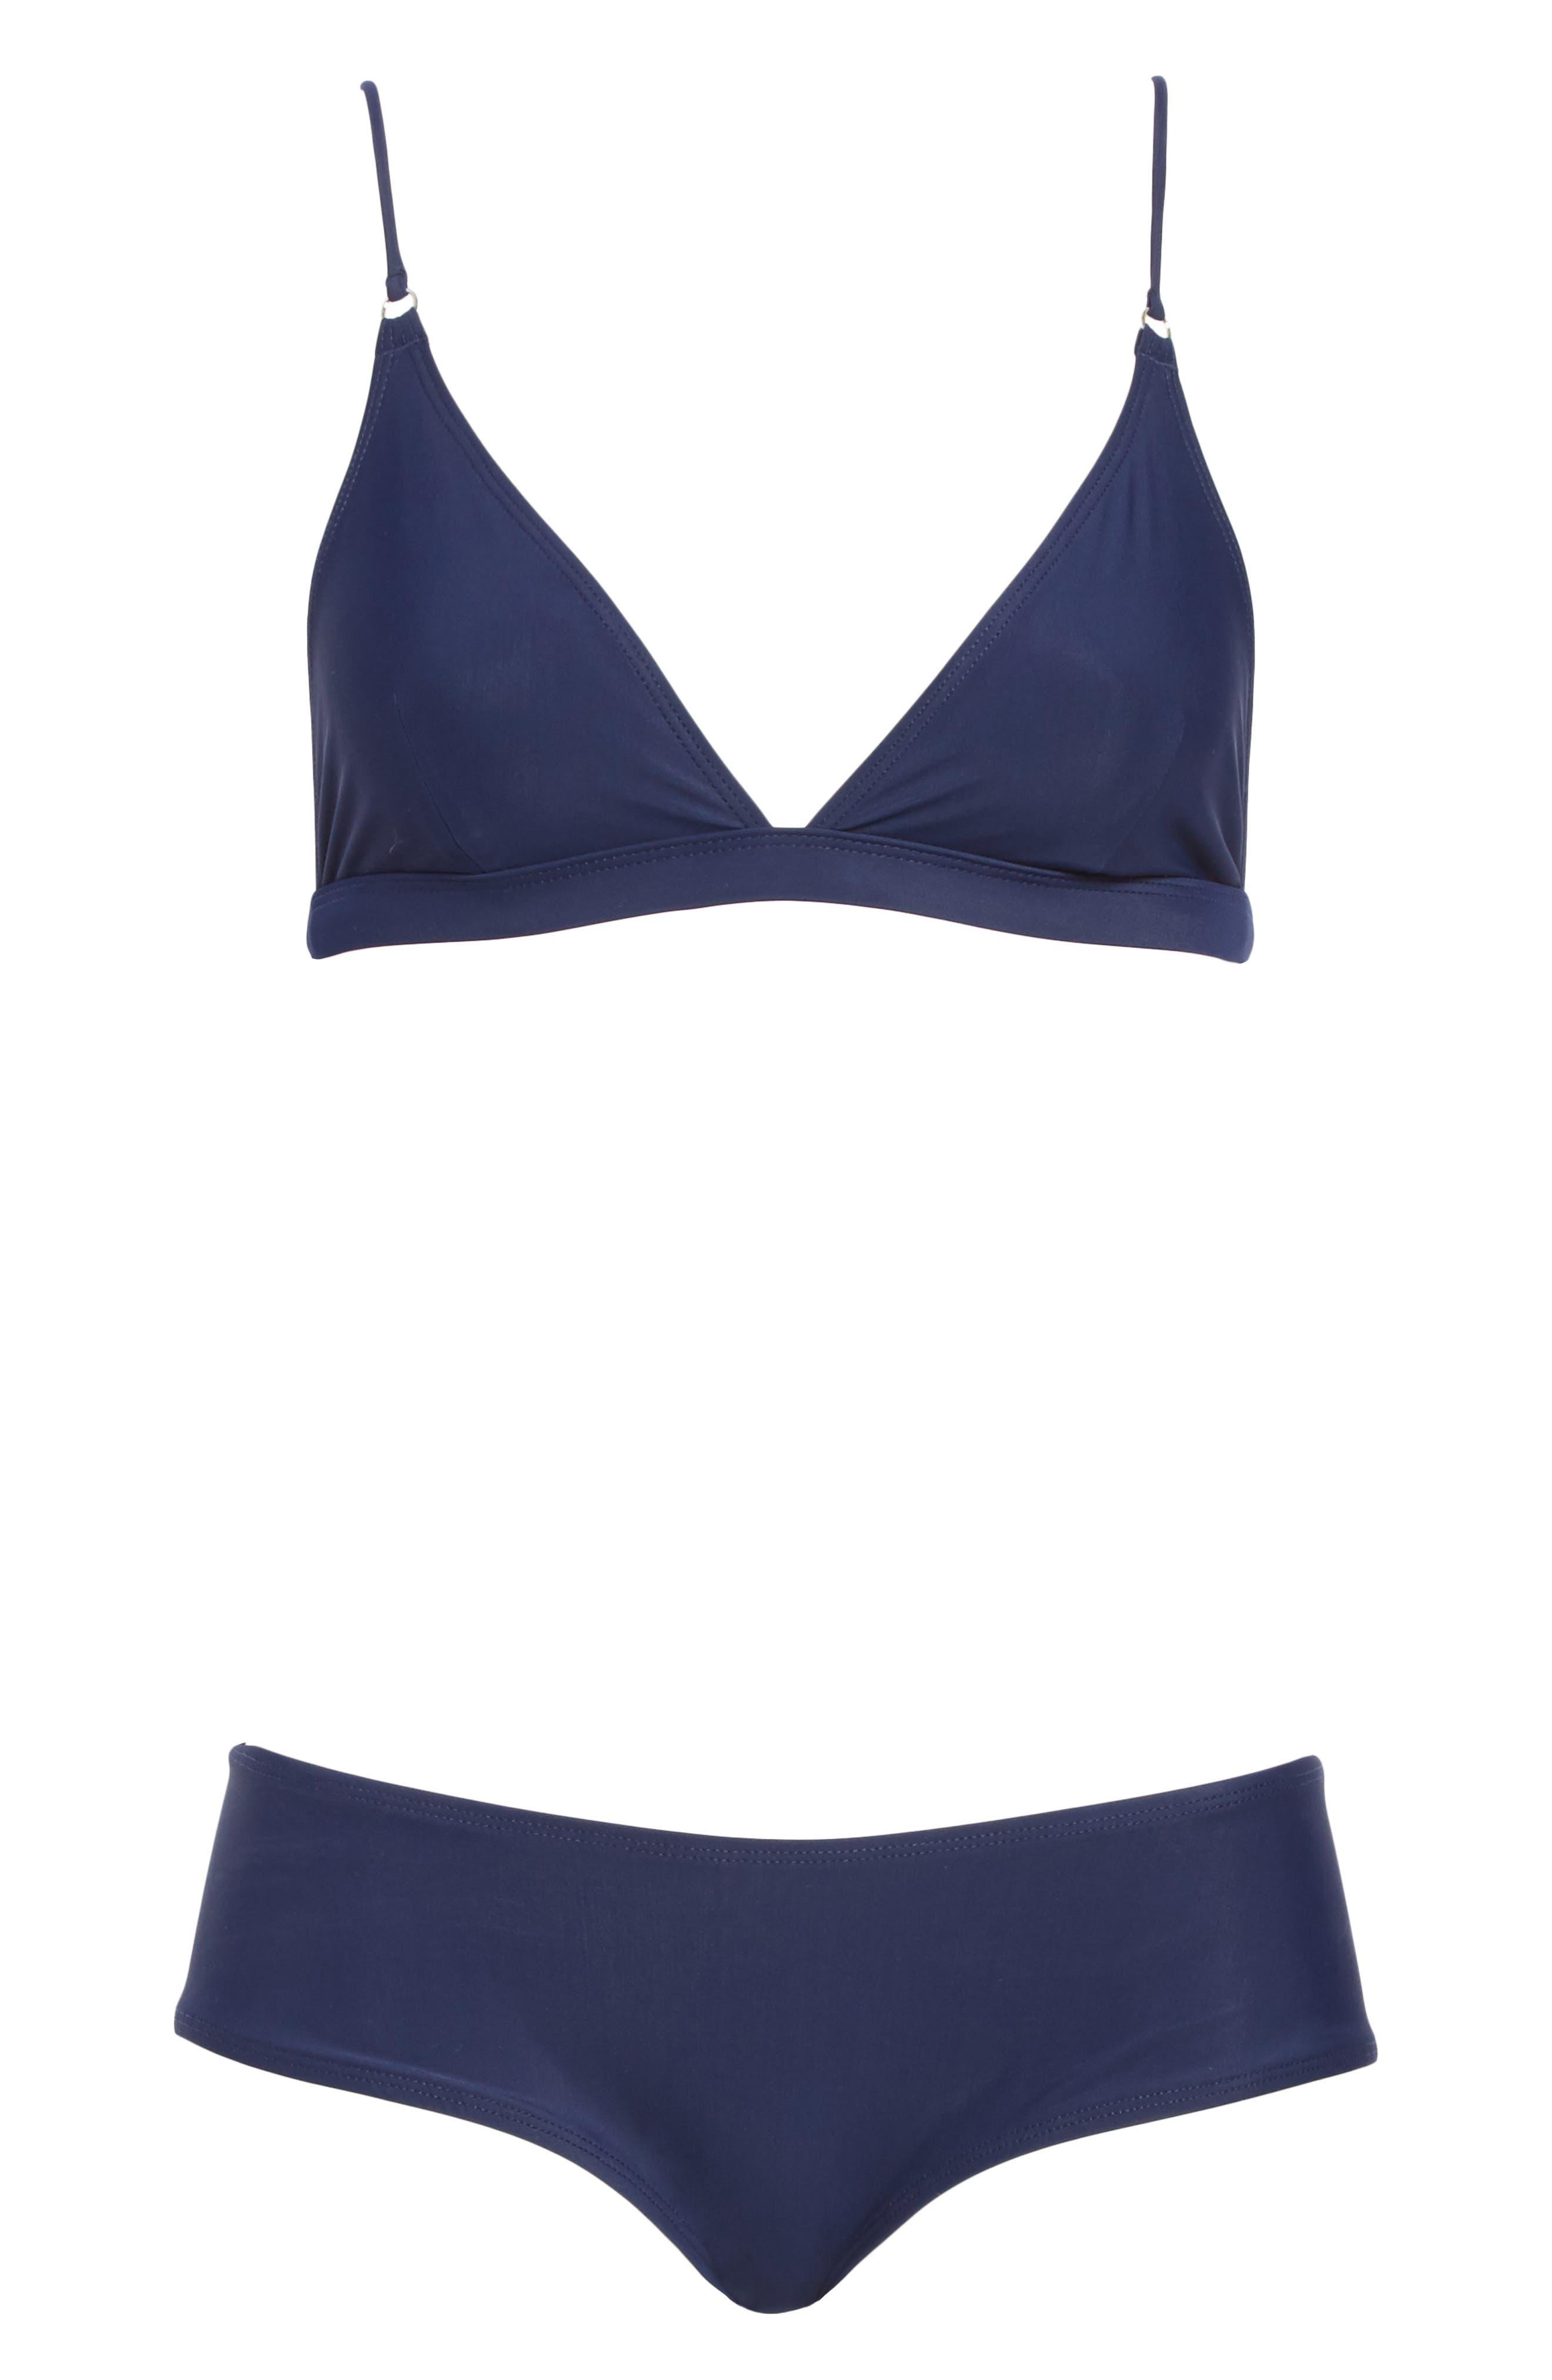 Hedea Bikini Set,                             Alternate thumbnail 6, color,                             400